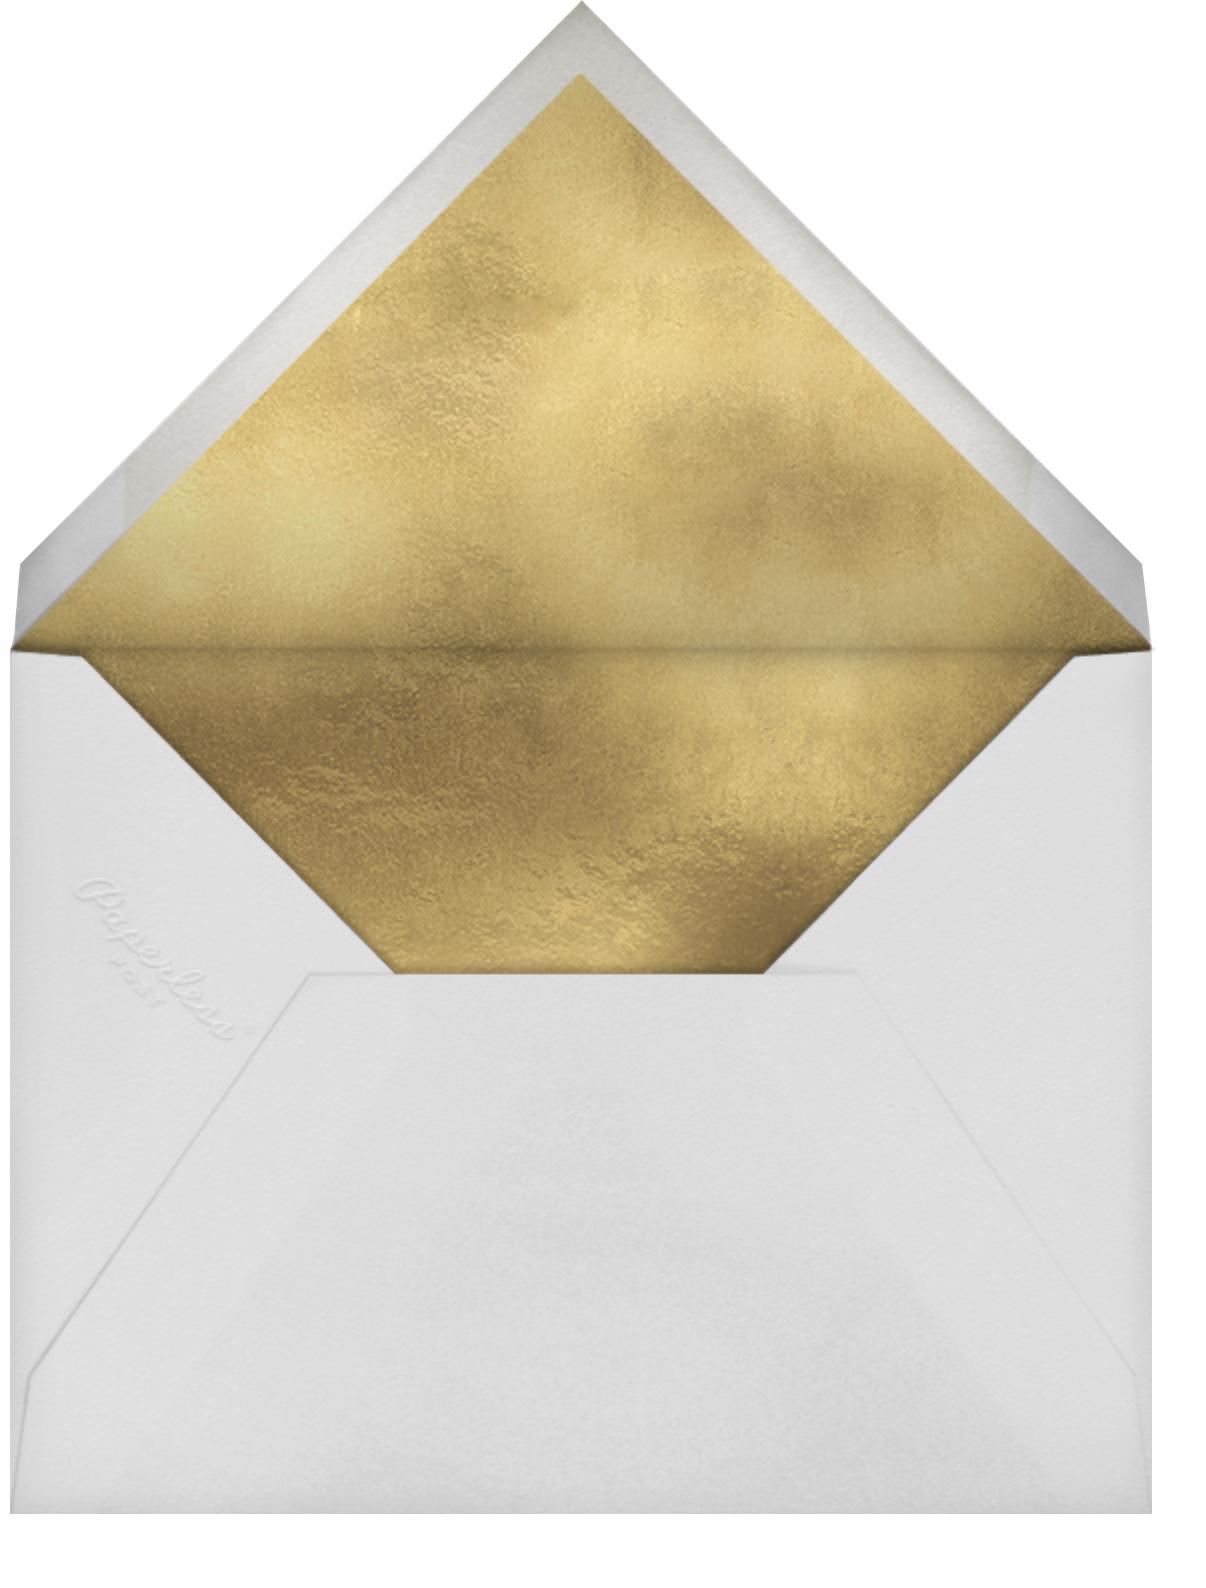 Third Party - Sugar Paper - Adult birthday - envelope back